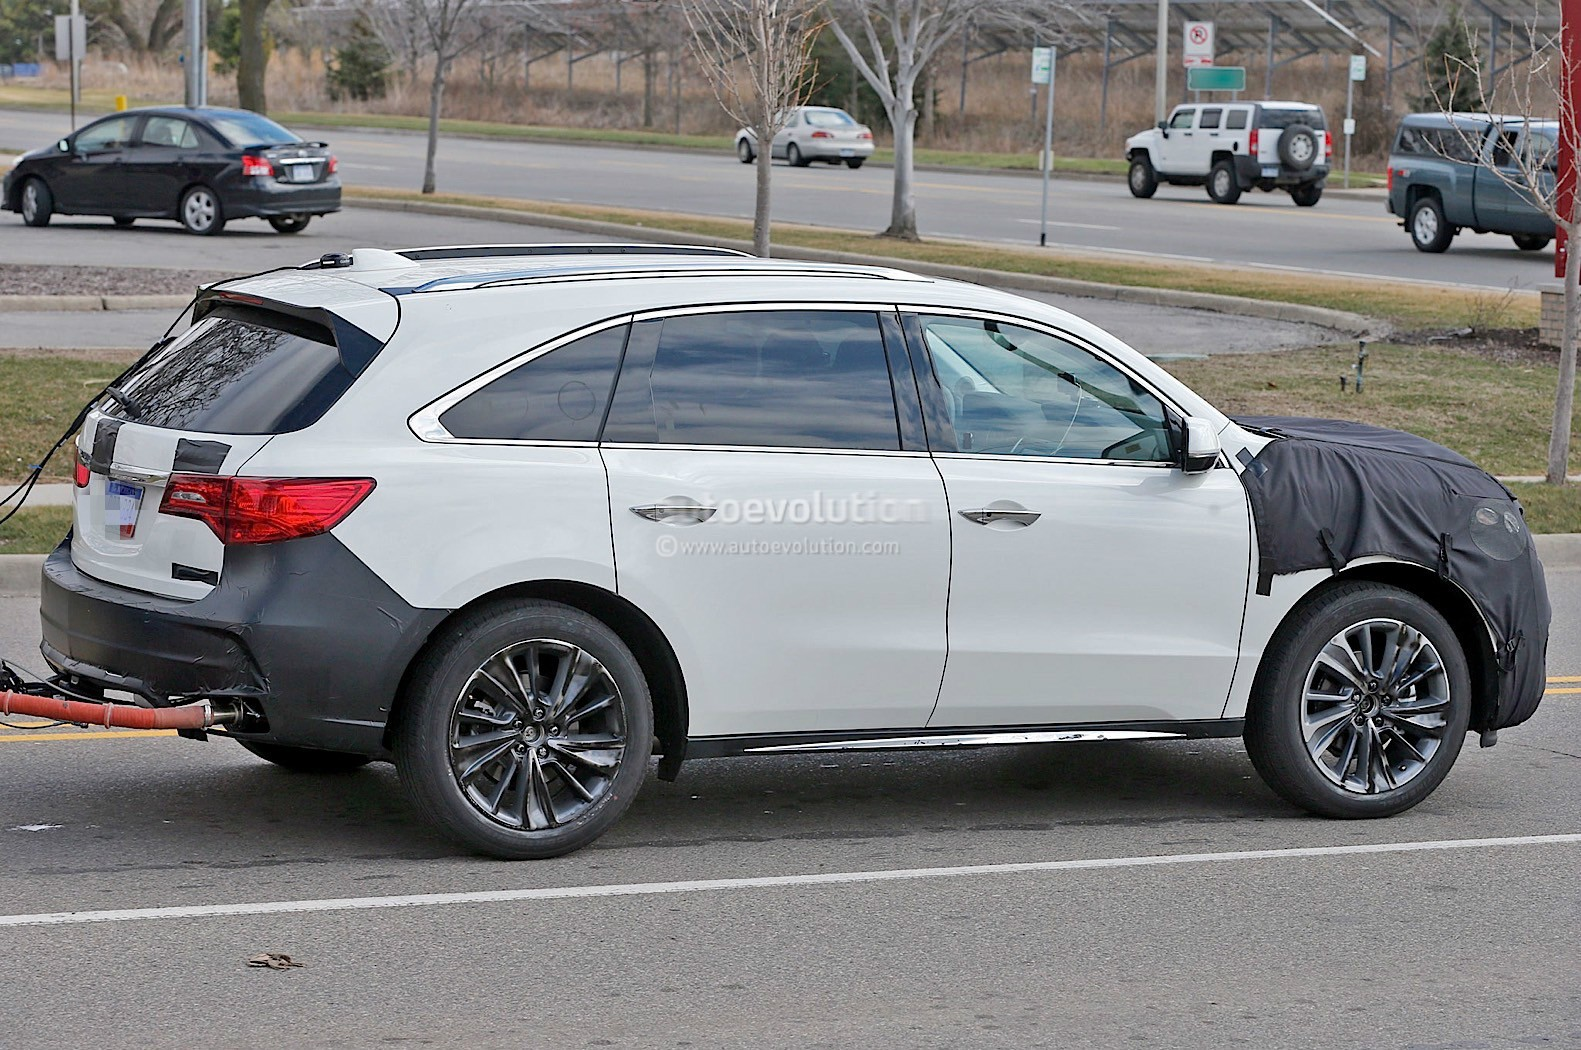 2017 Acura MDX Will Finally Lose the Beak - autoevolution